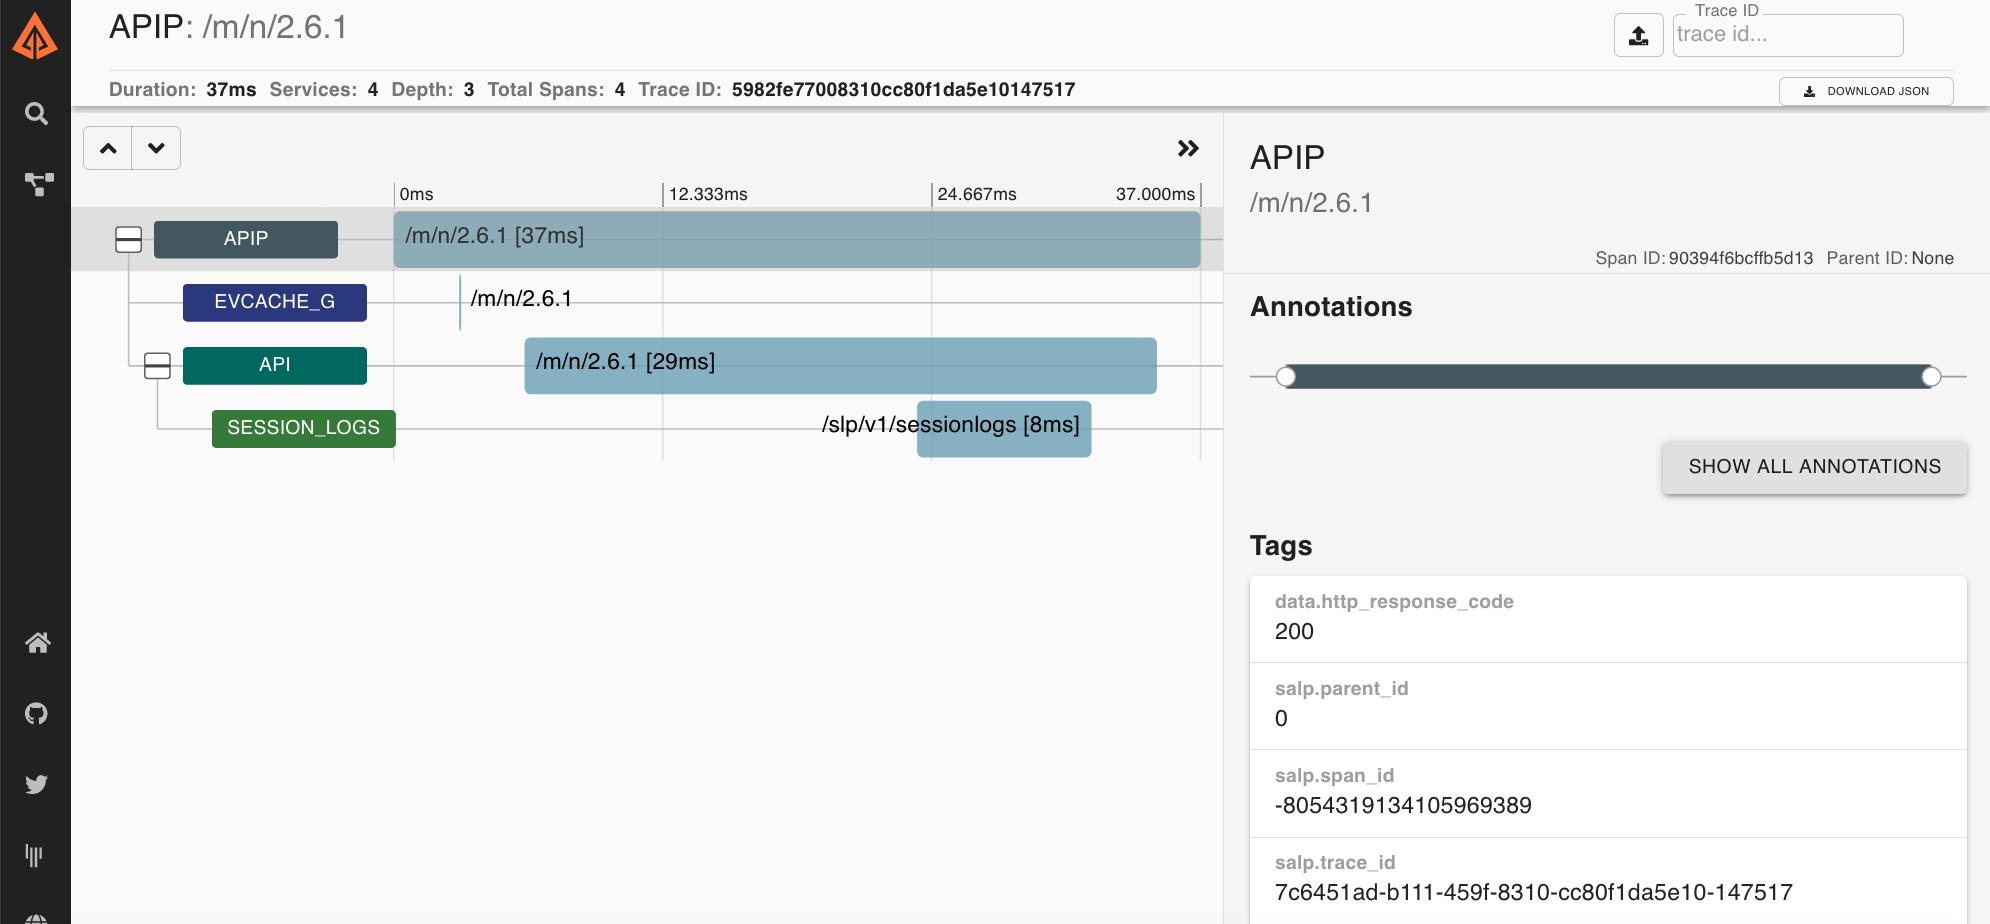 Screenshot 2020-03-03 at 1 24 07 PM